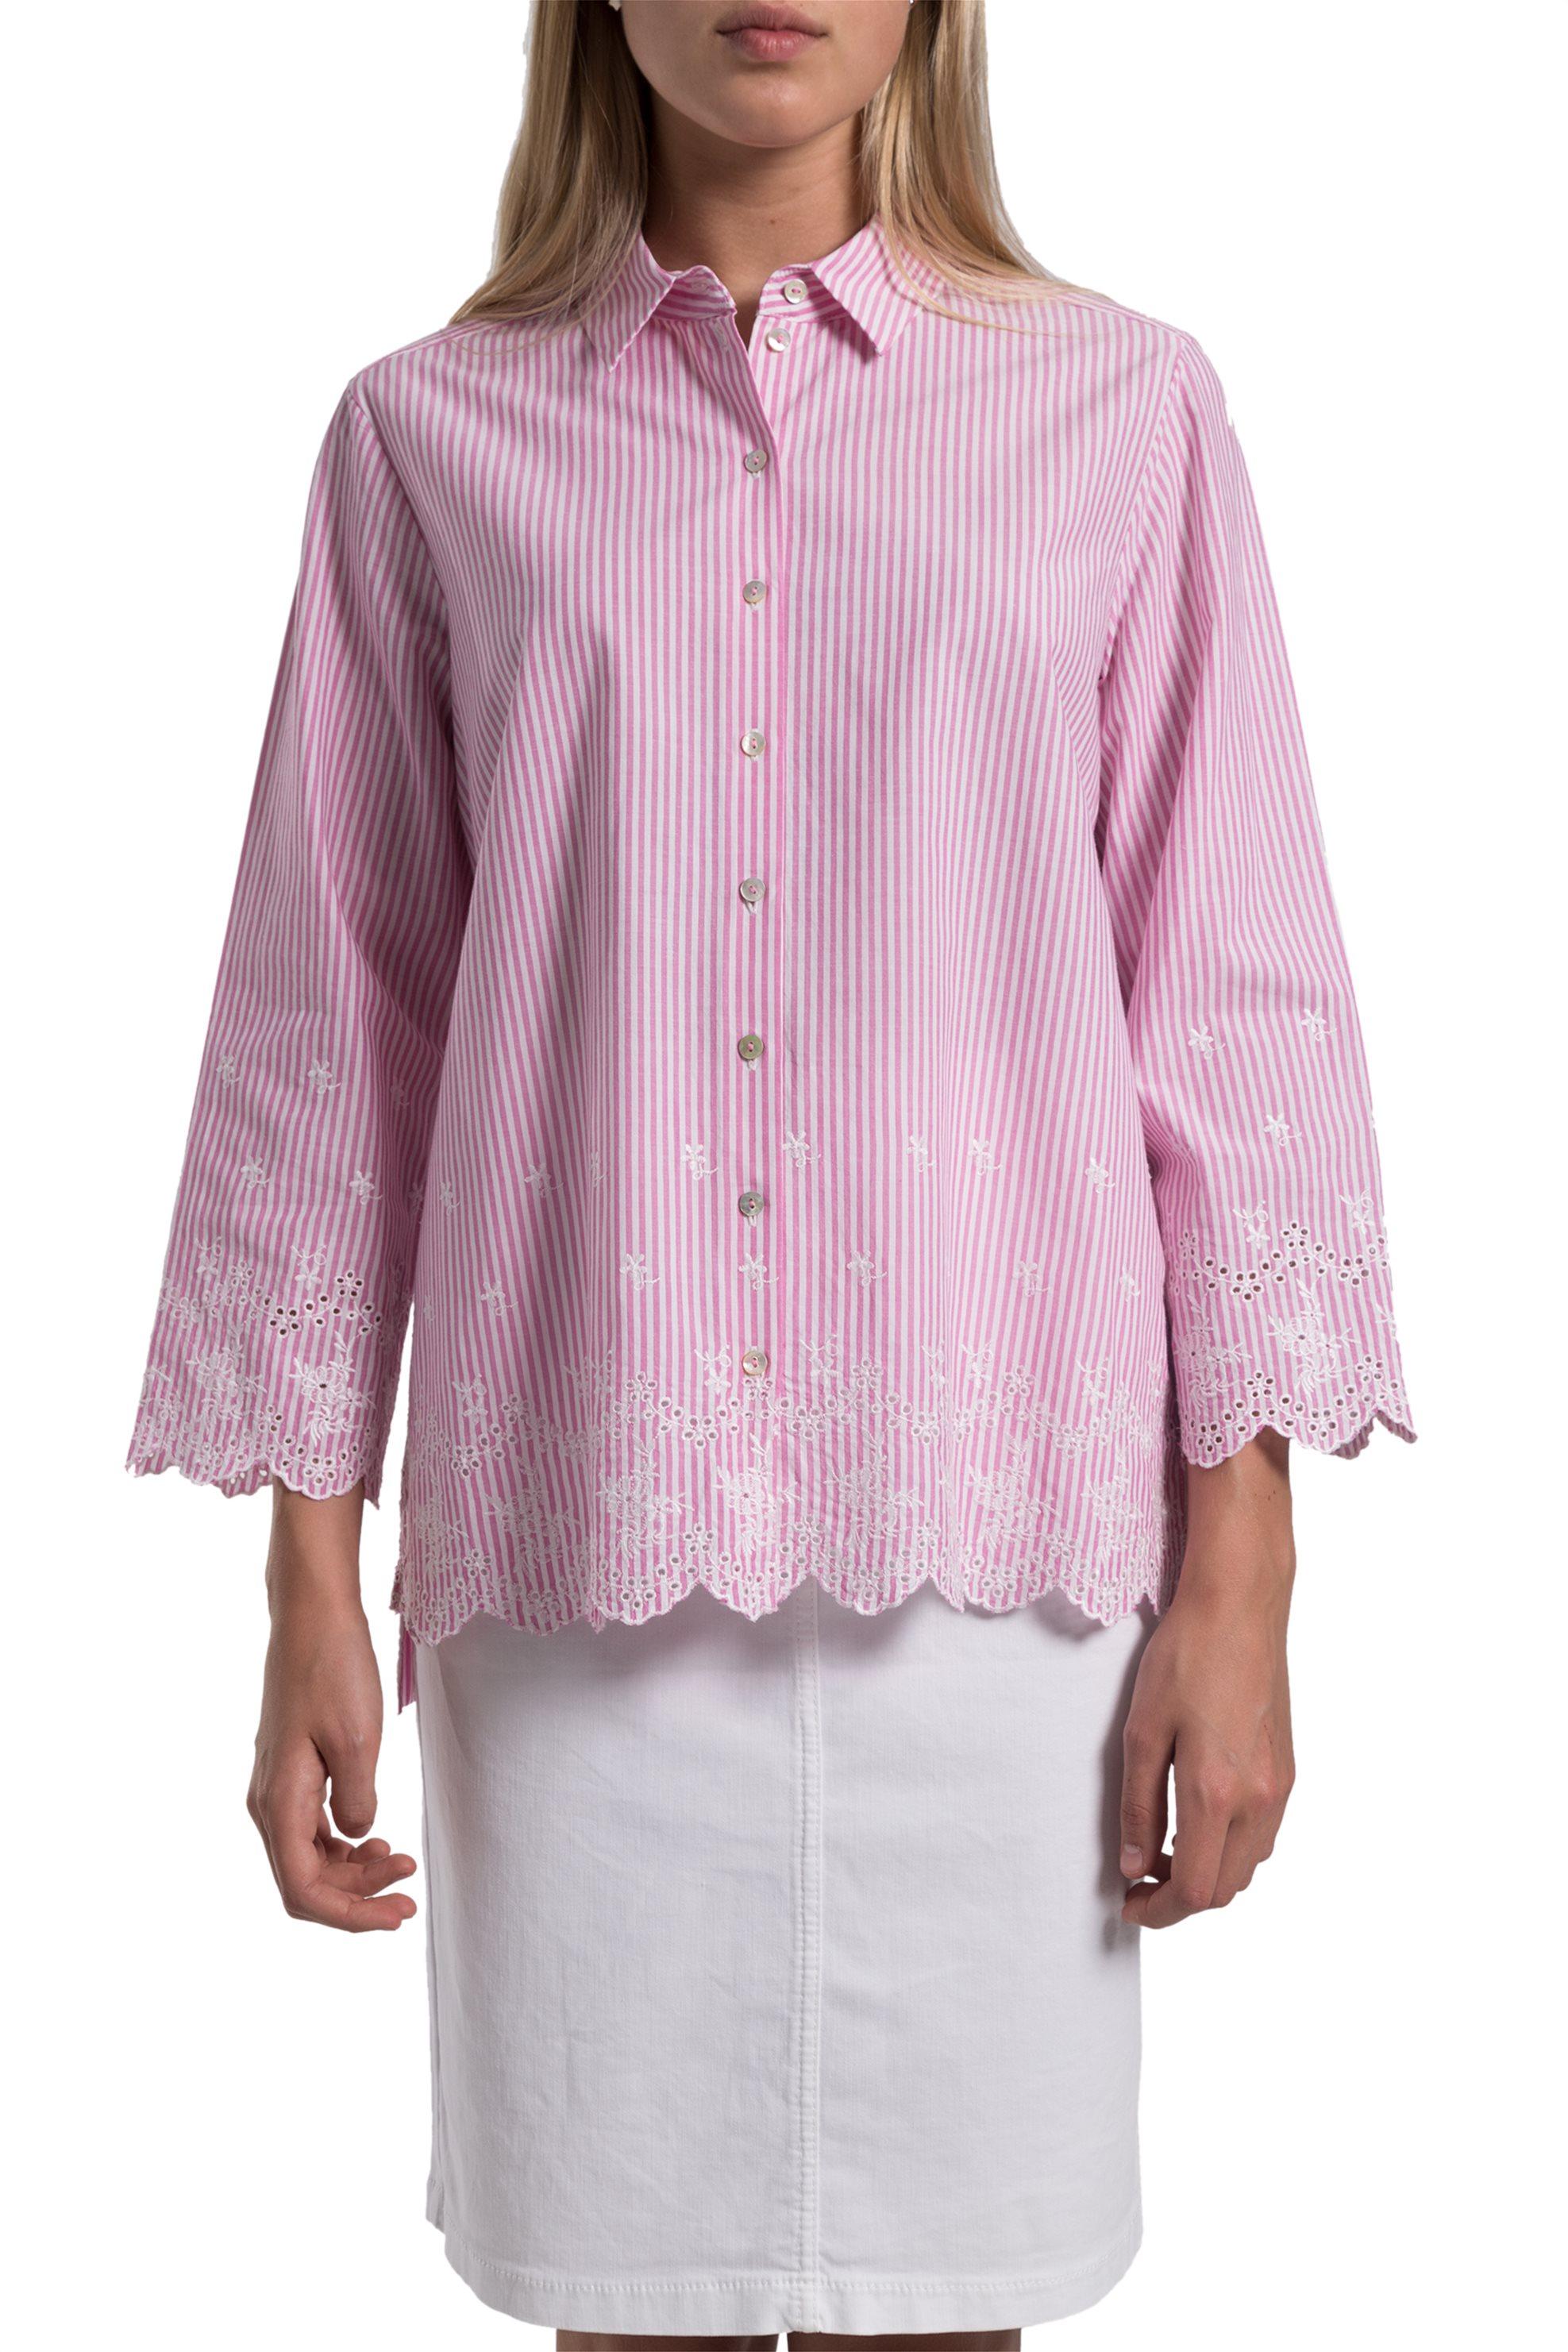 59fcaf32430b Γυναικεία   Ρούχα   Πουκάμισα   Λινό γυναικείο πουκάμισο με τσέπες ...